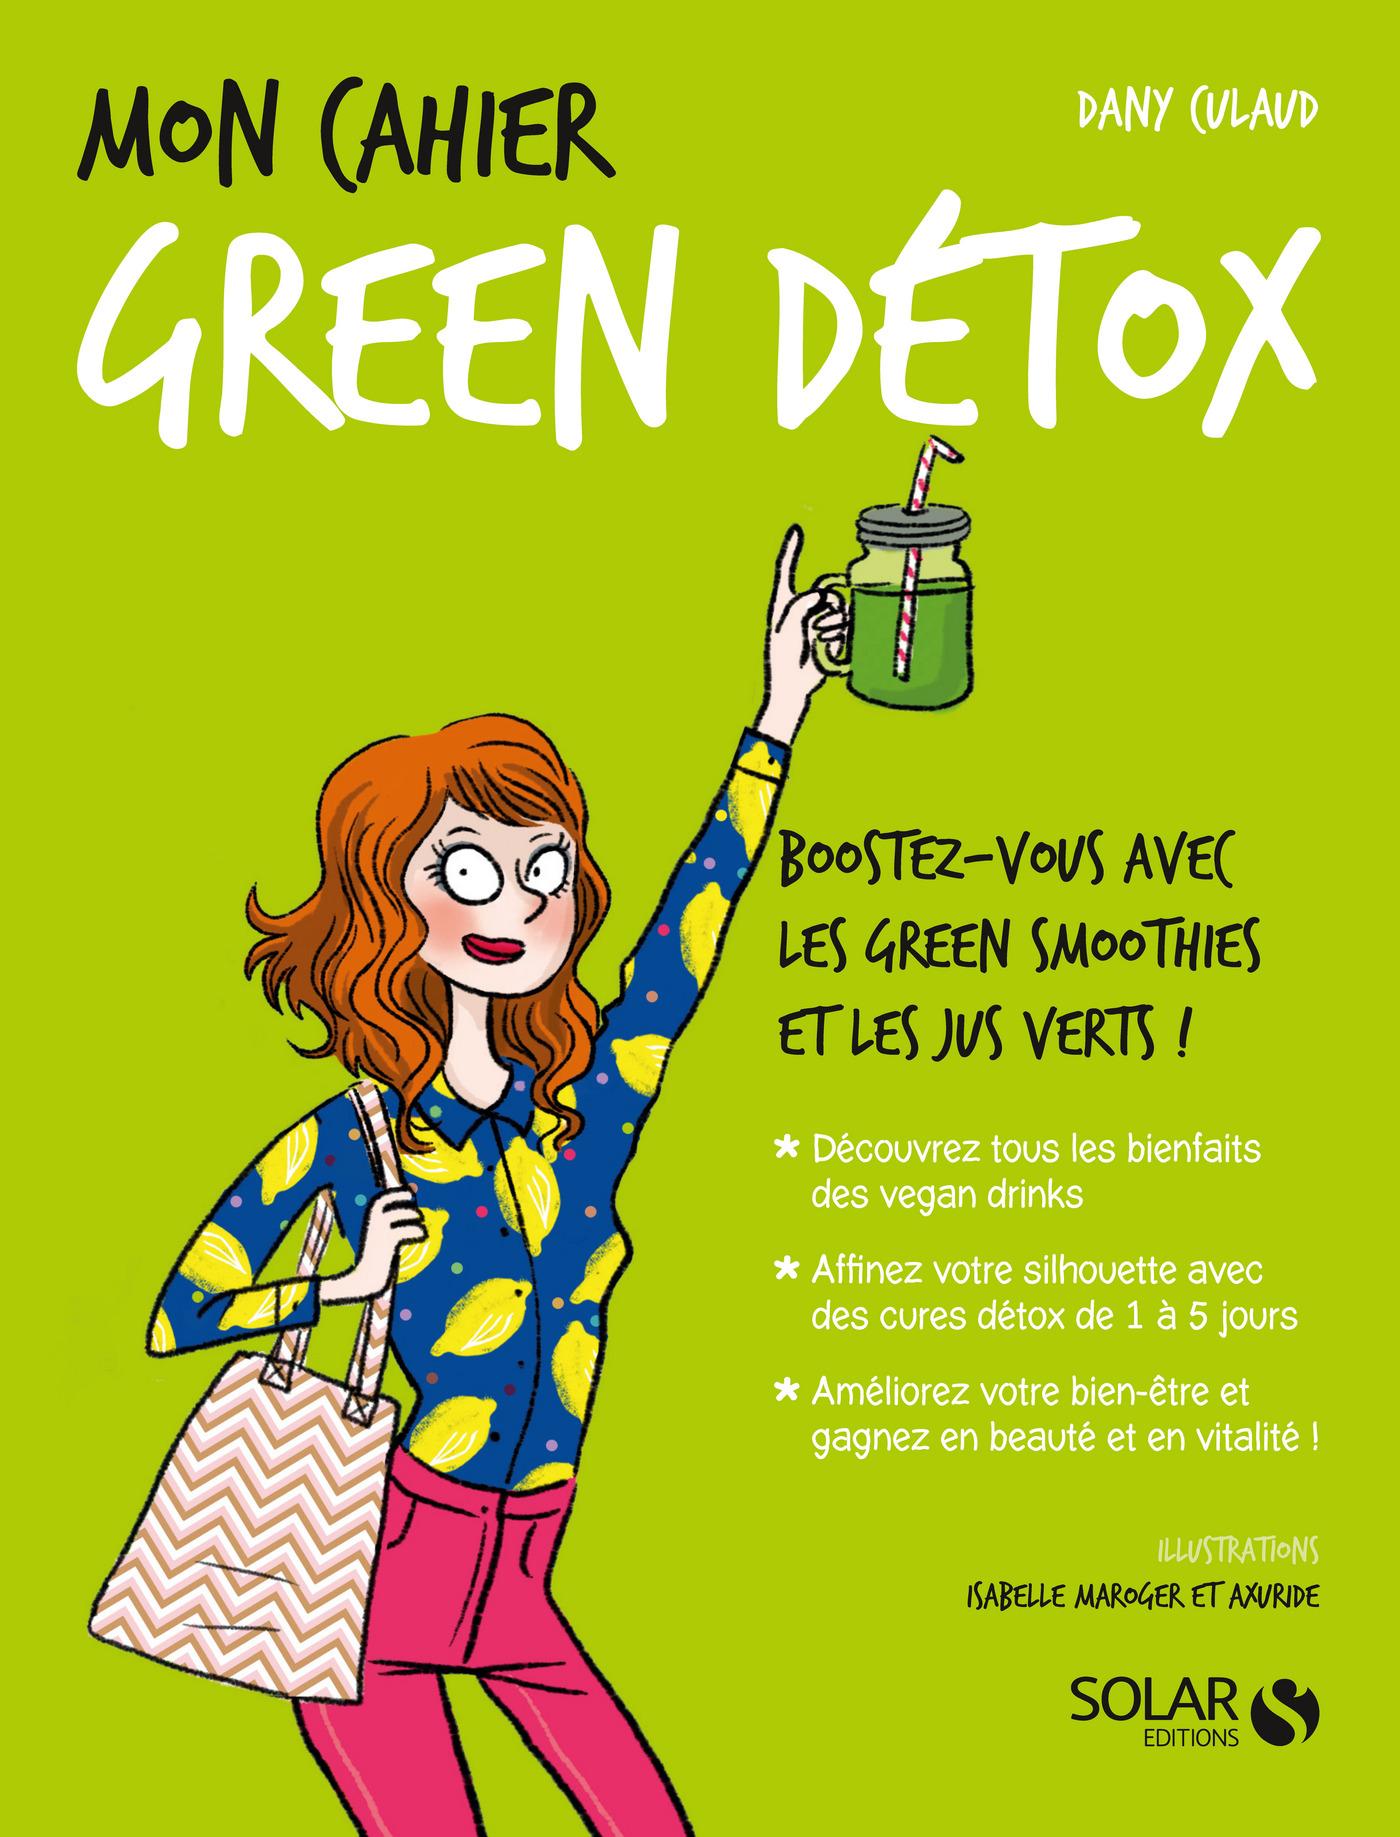 Mon cahier Green détox